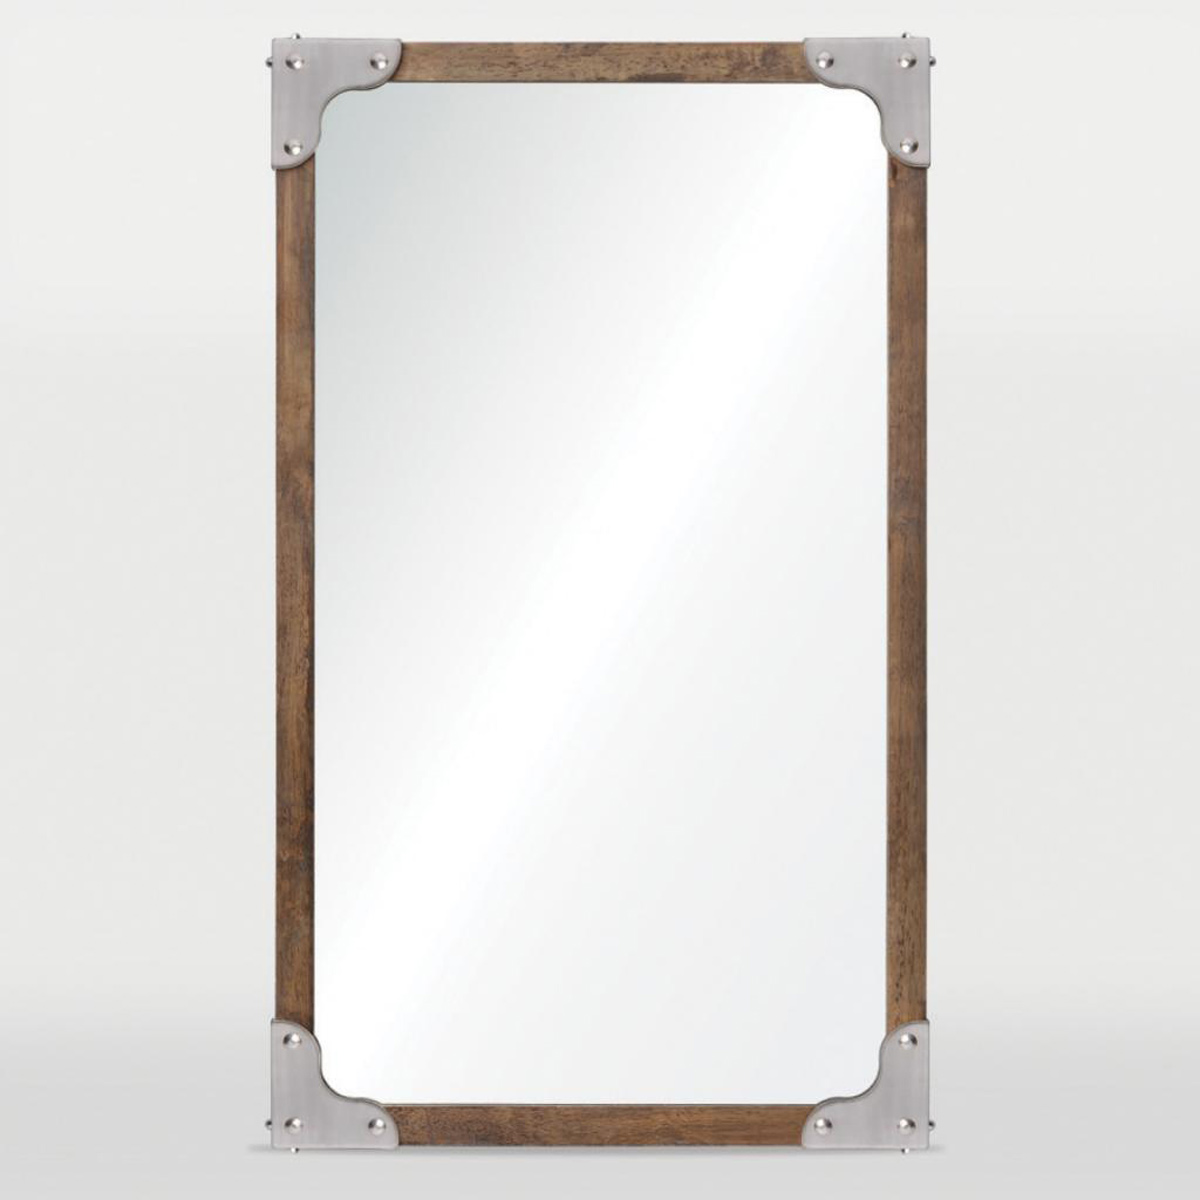 Ren-Wil Advocate Mirror - Satin Nickel